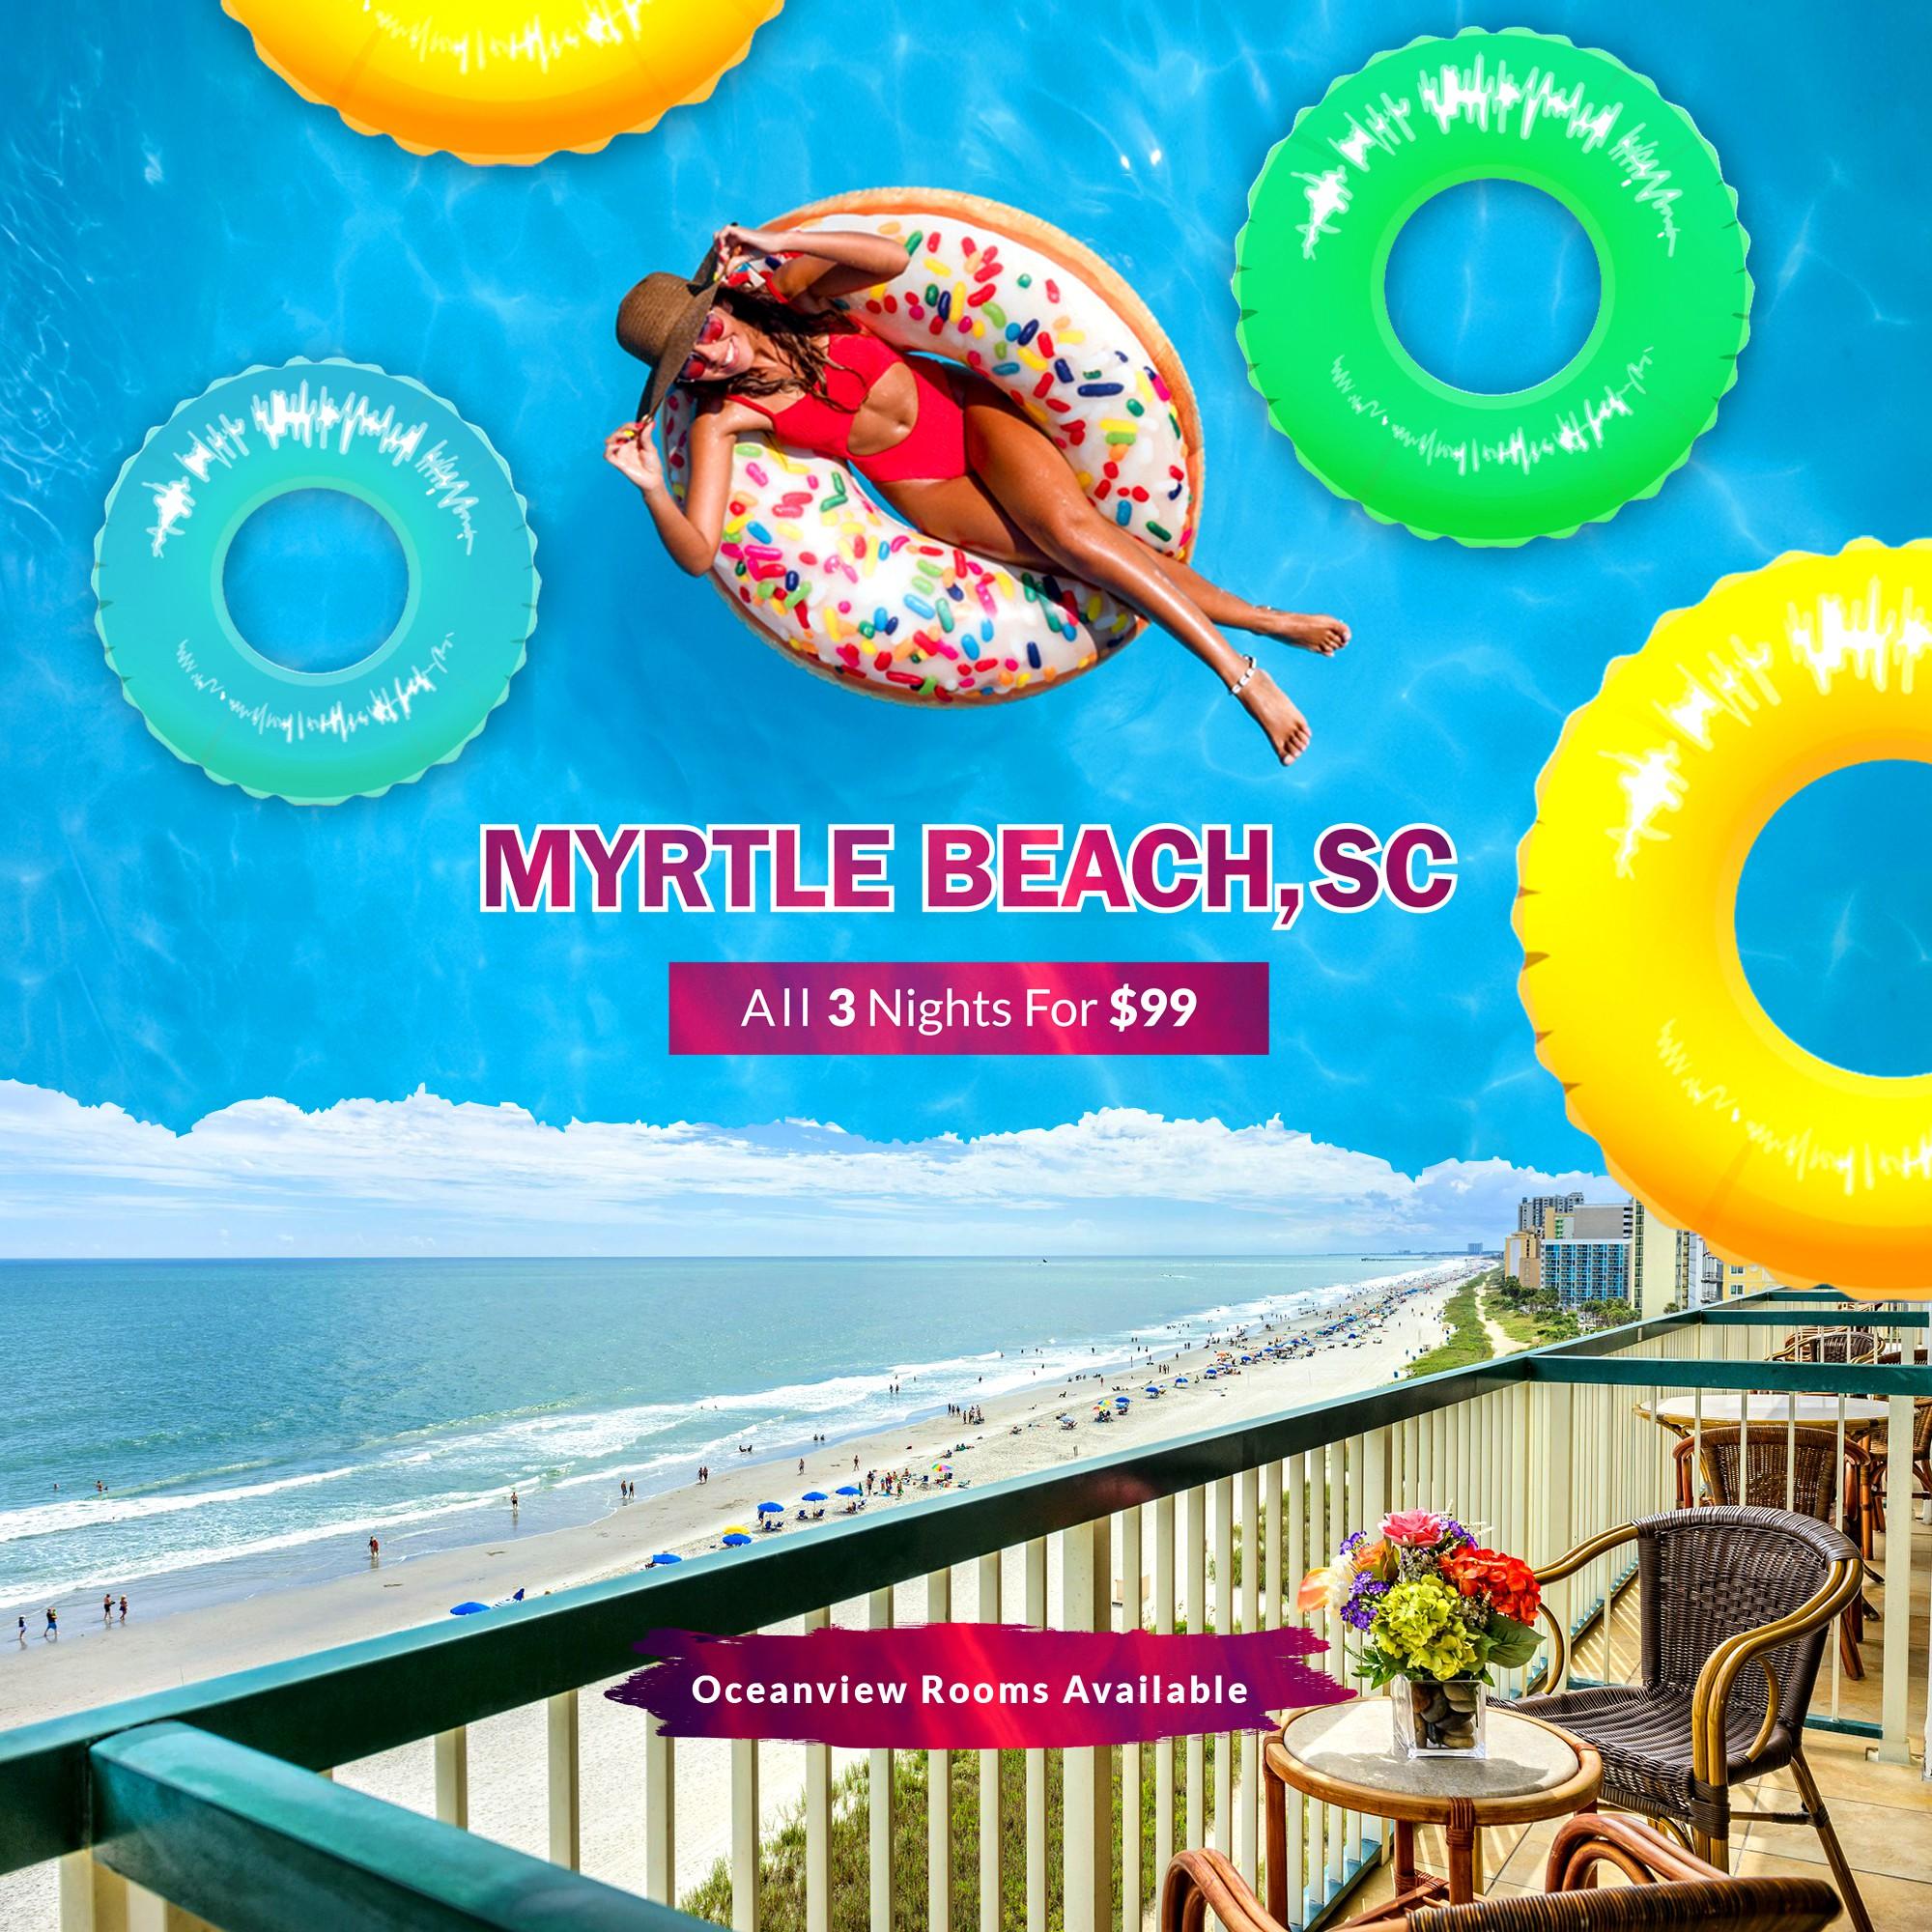 Create a 1:1 Facebook Banner - Myrtle Beach